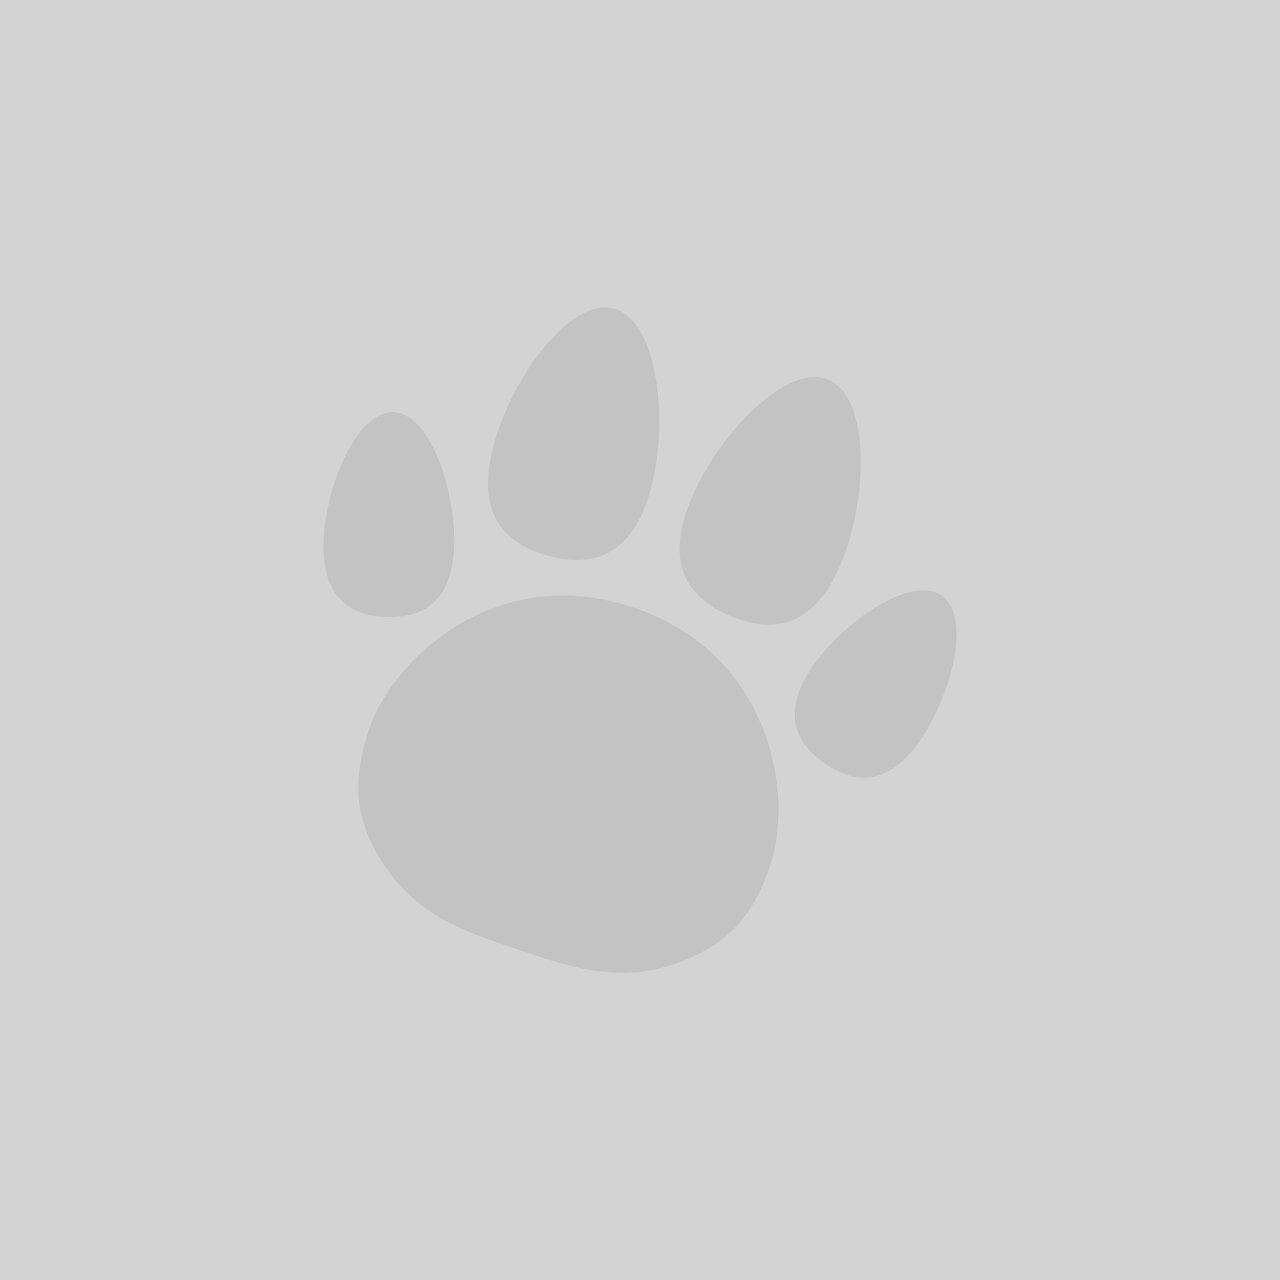 Rufus & Rosie Dog Lead Bright Stripes Small